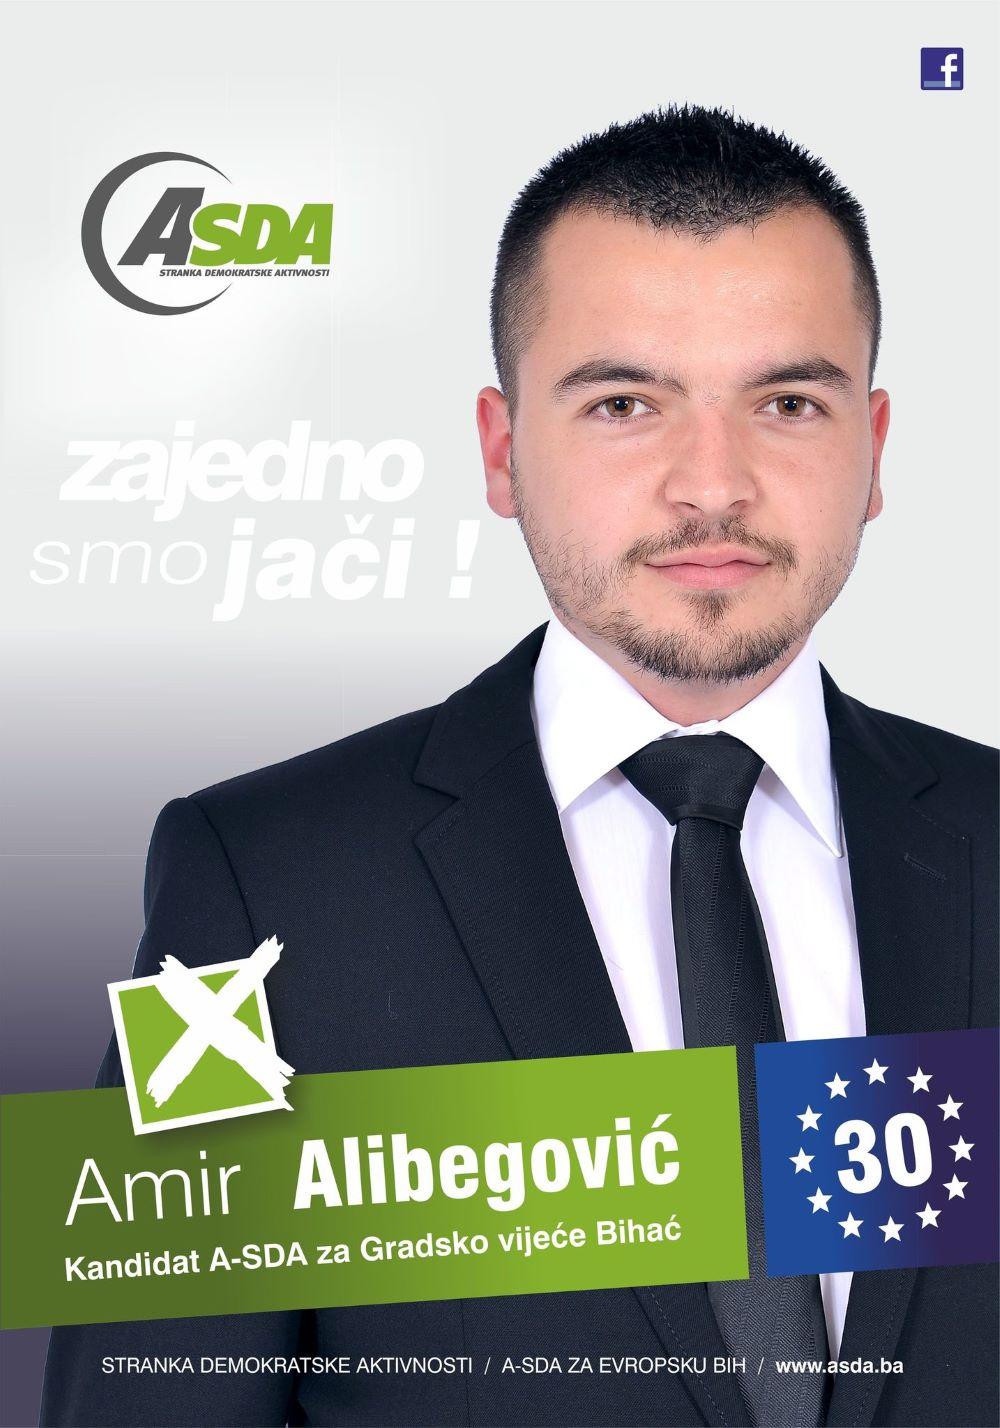 Amir Alibegović